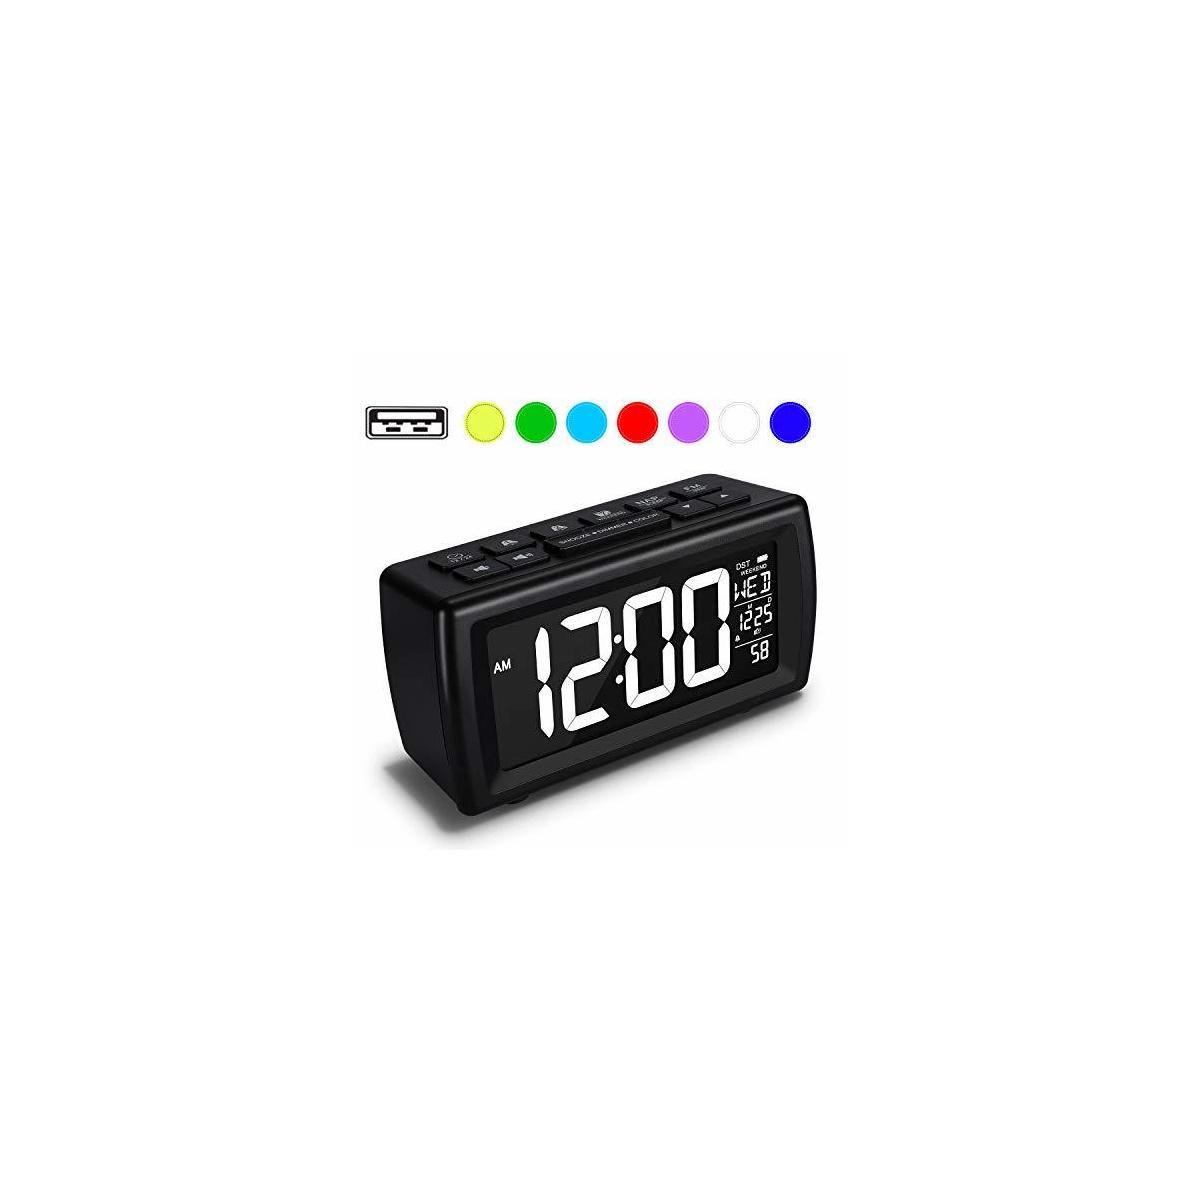 AZUTTA Digital Alarm Clock Radio with 7-Color Digit Display and Dimmer for Bedroom Travel Dorm Desk, Volume Adjustable, Snooze, Weekend, Calendar, DST, FM Sleep Timer, Nap Countdown, USB Phone Charger